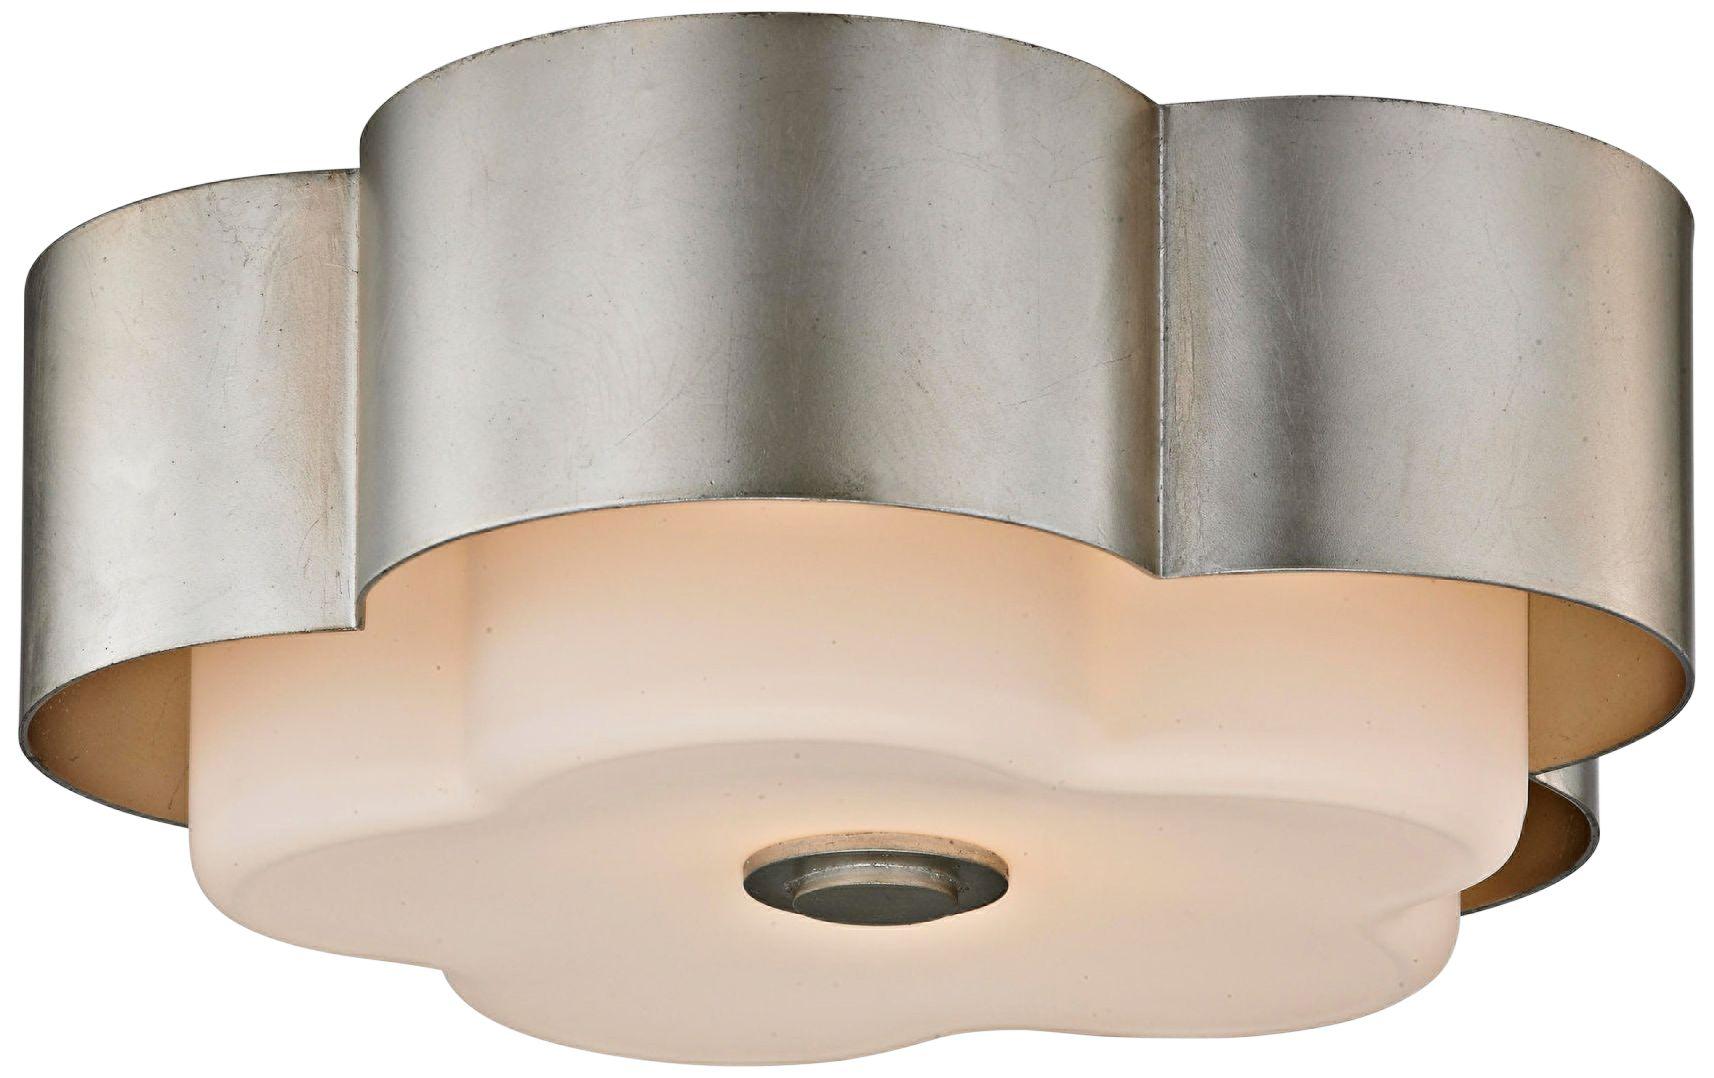 Allure 13 1/2  Wide Silver Leaf Ceiling Light  sc 1 st  L&s Plus & Allure 13 1/2